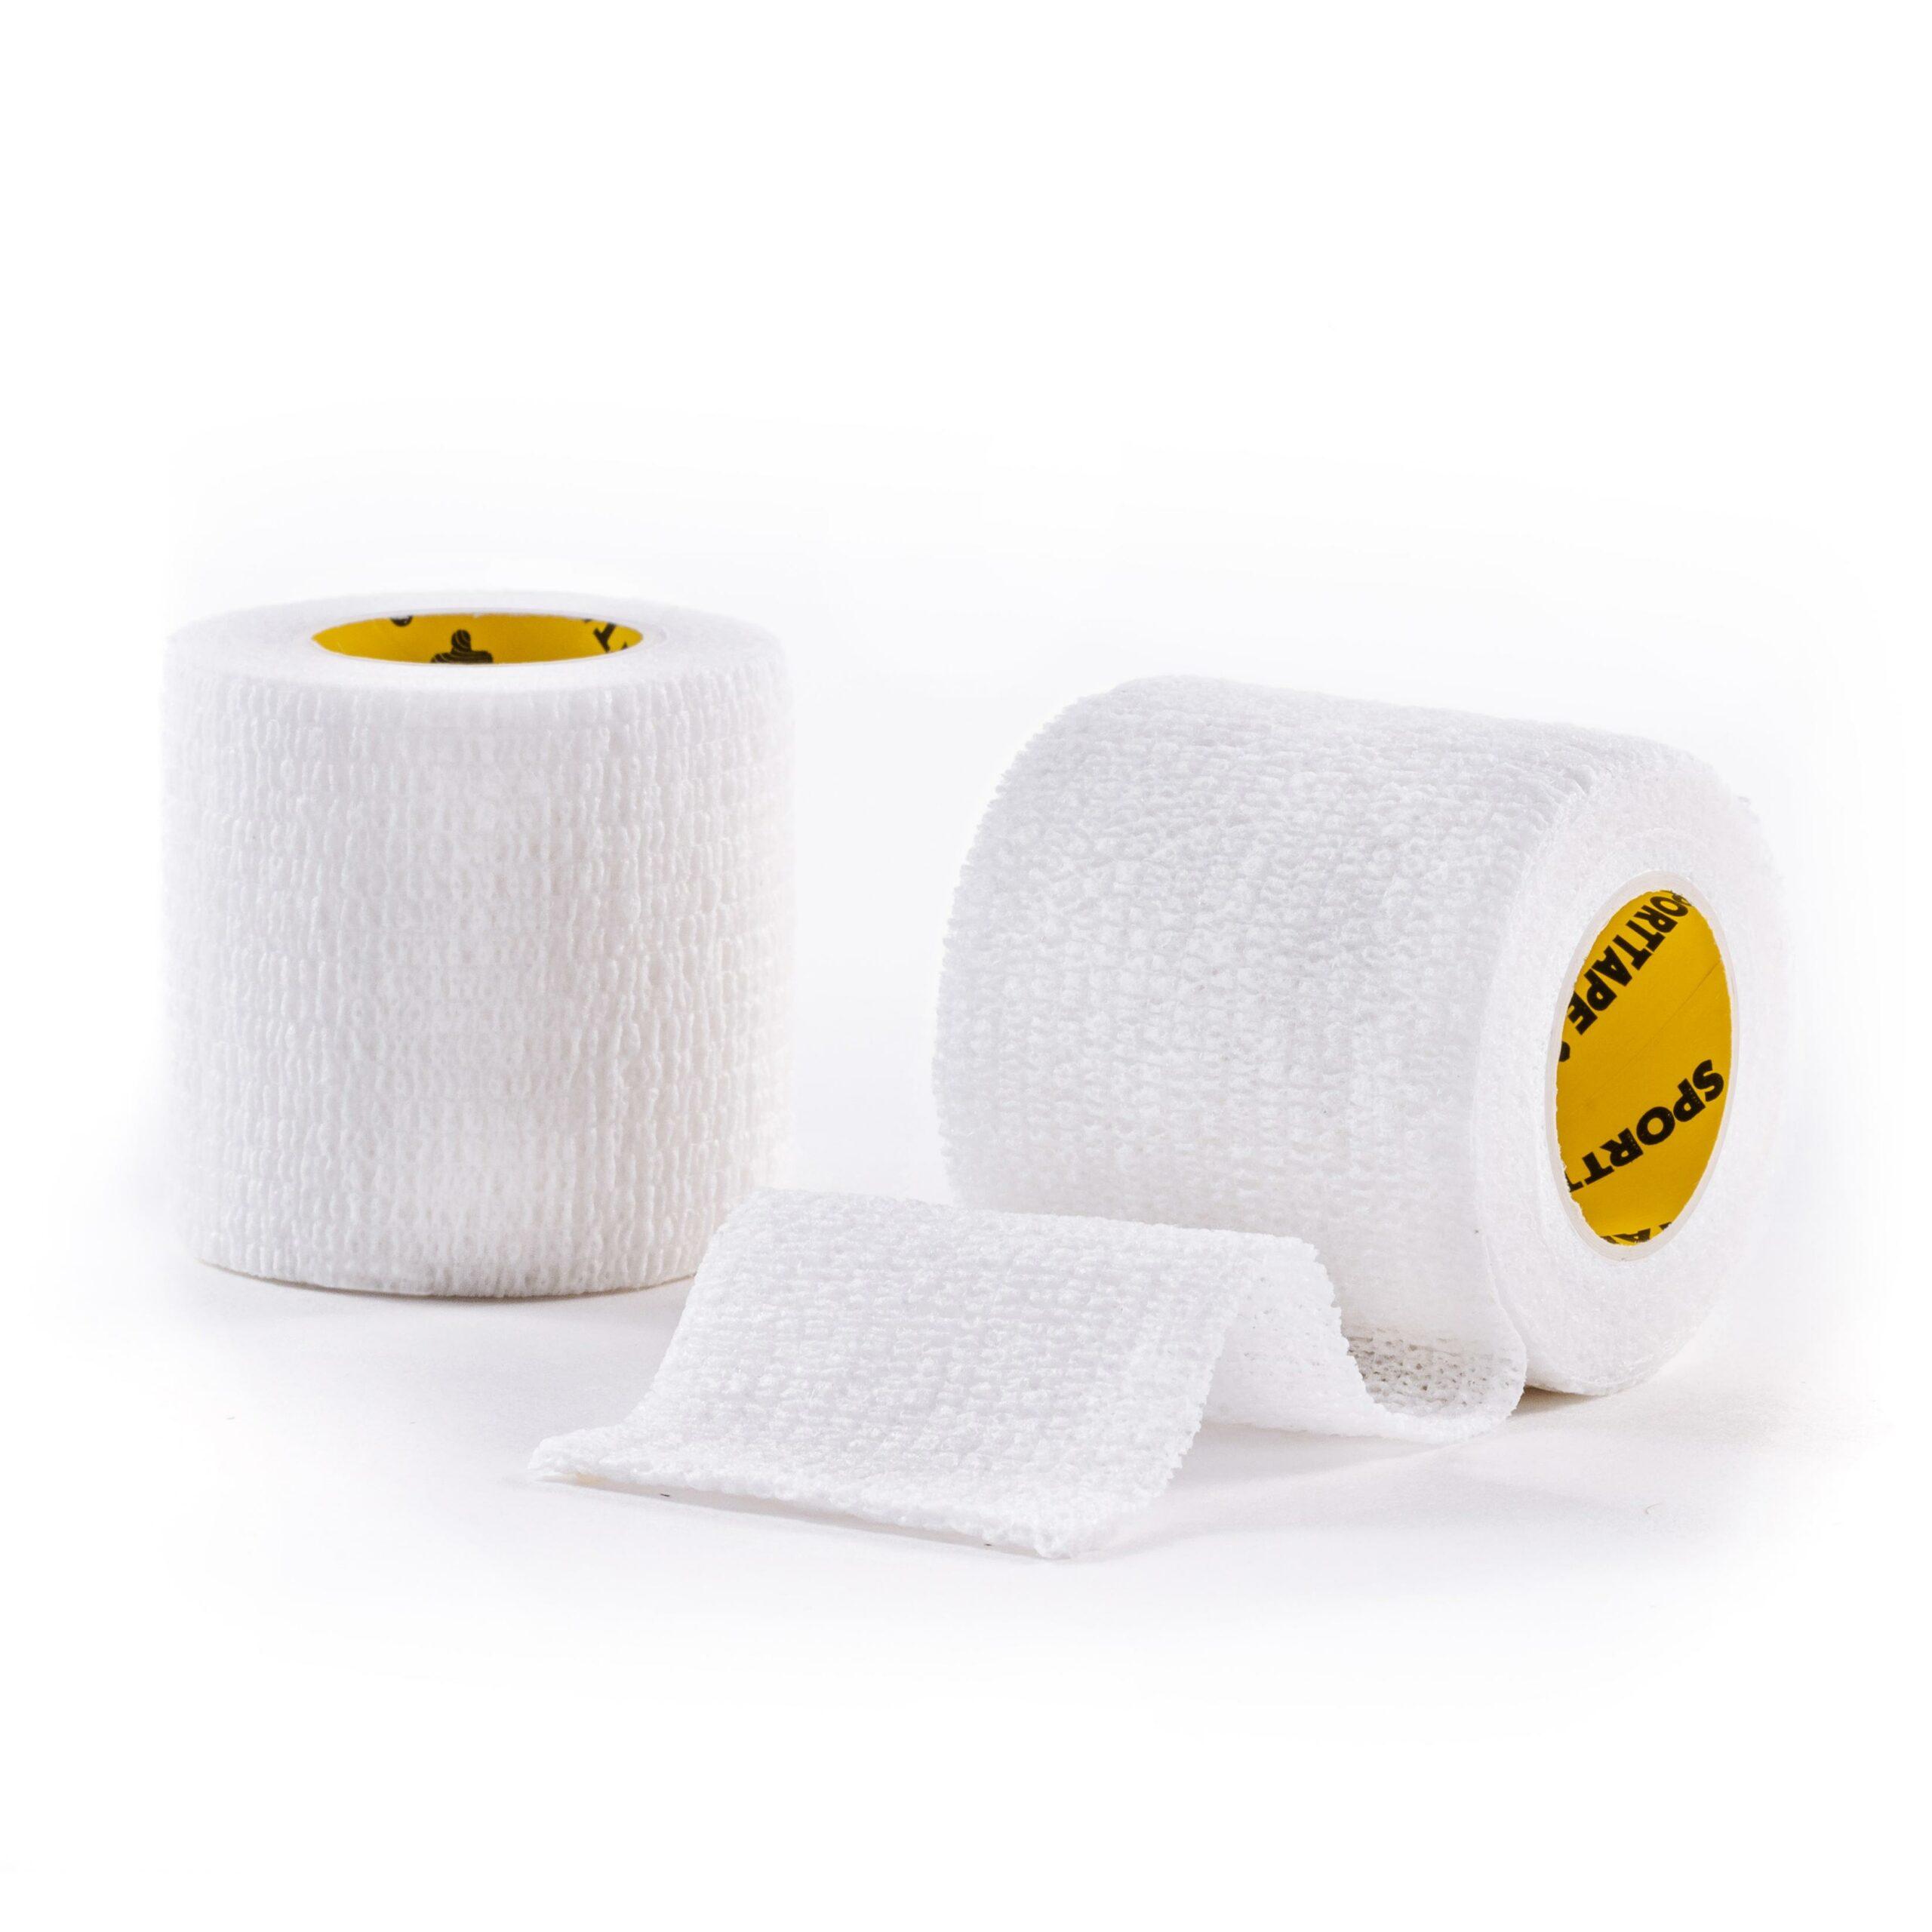 Cohesive Tape White 5cm 2 Rolls